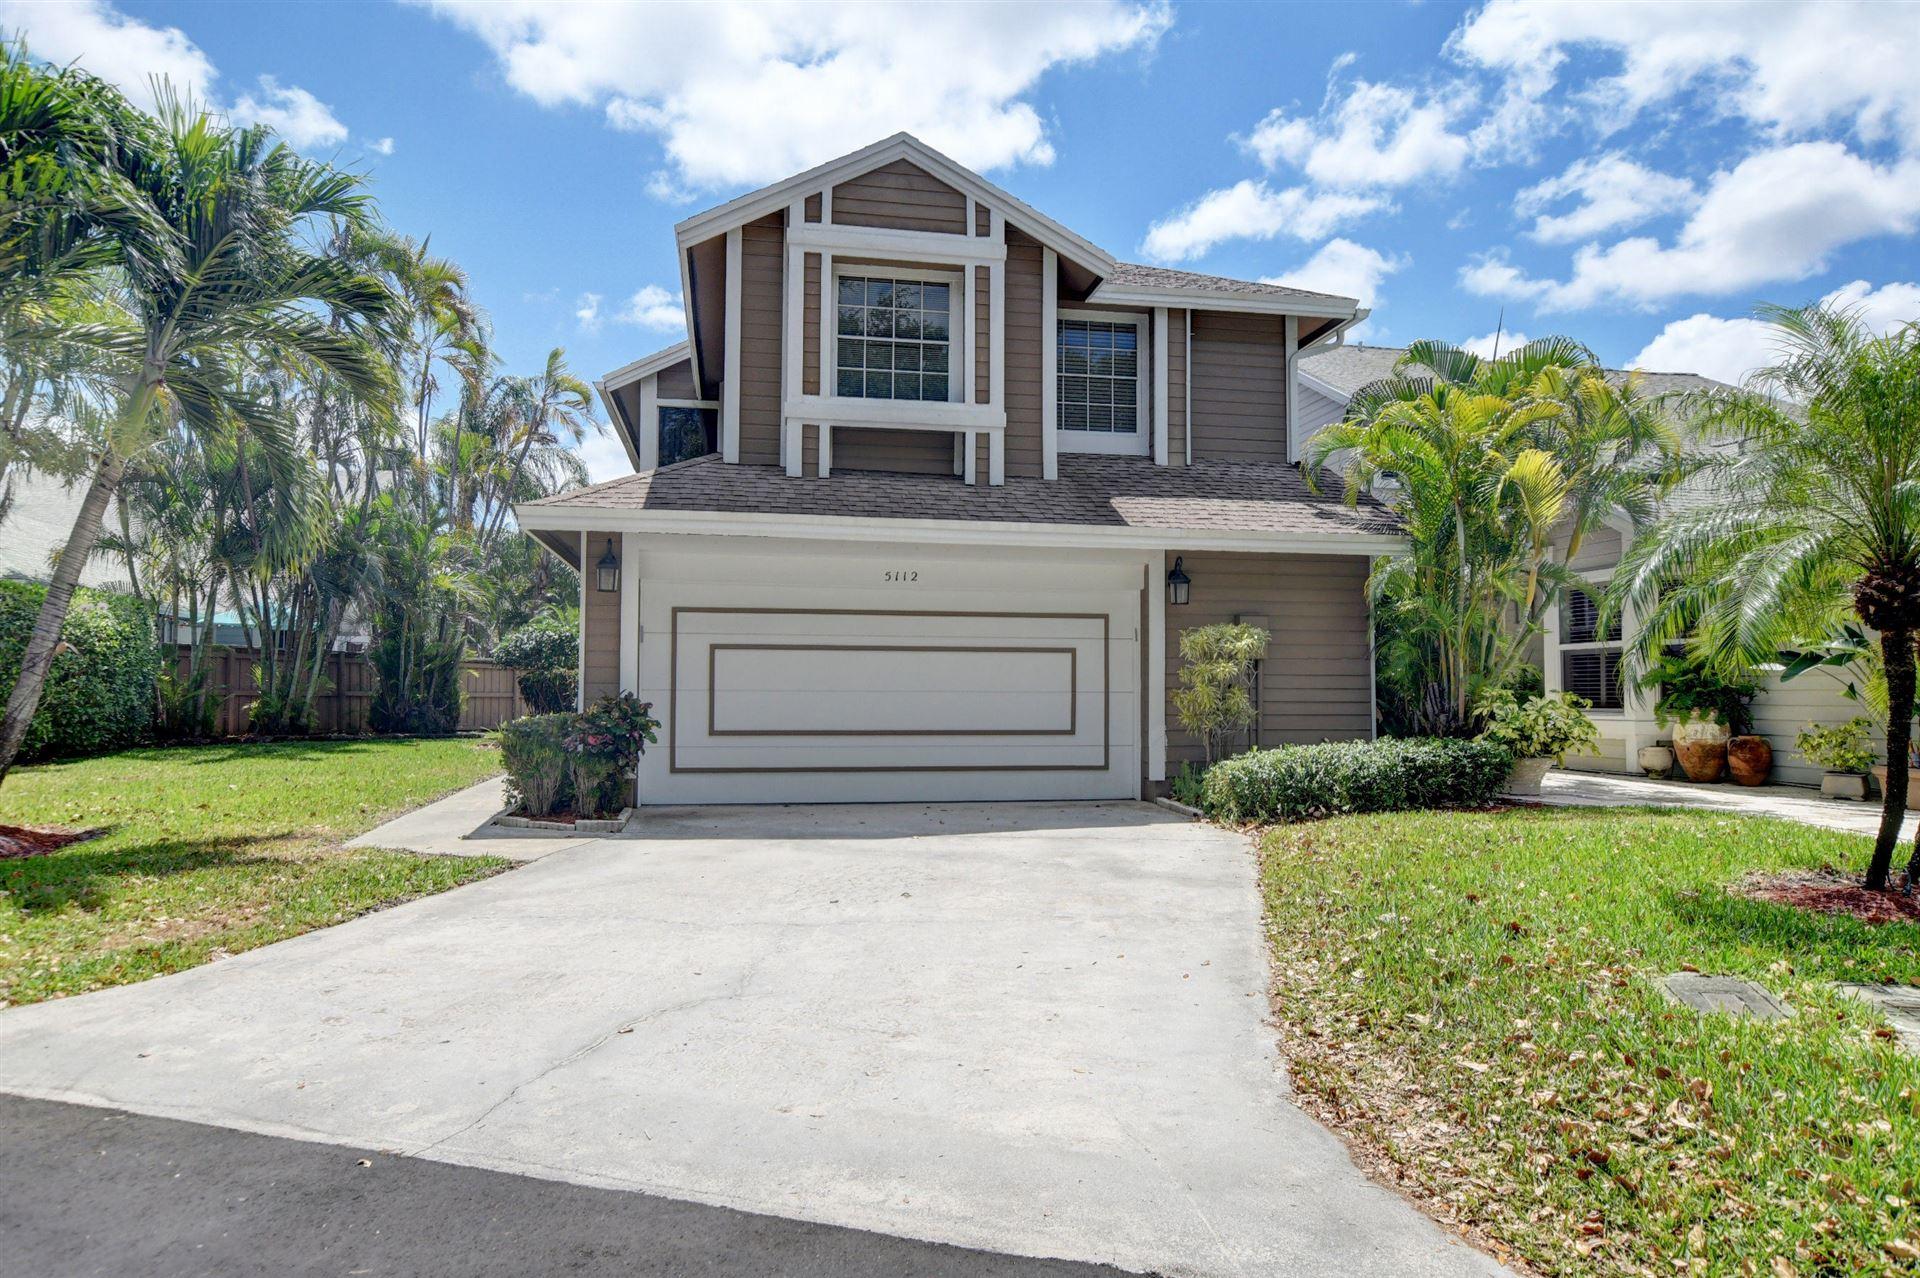 5112 Point Alexis Drive, Boca Raton, FL 33486 - #: RX-10707556